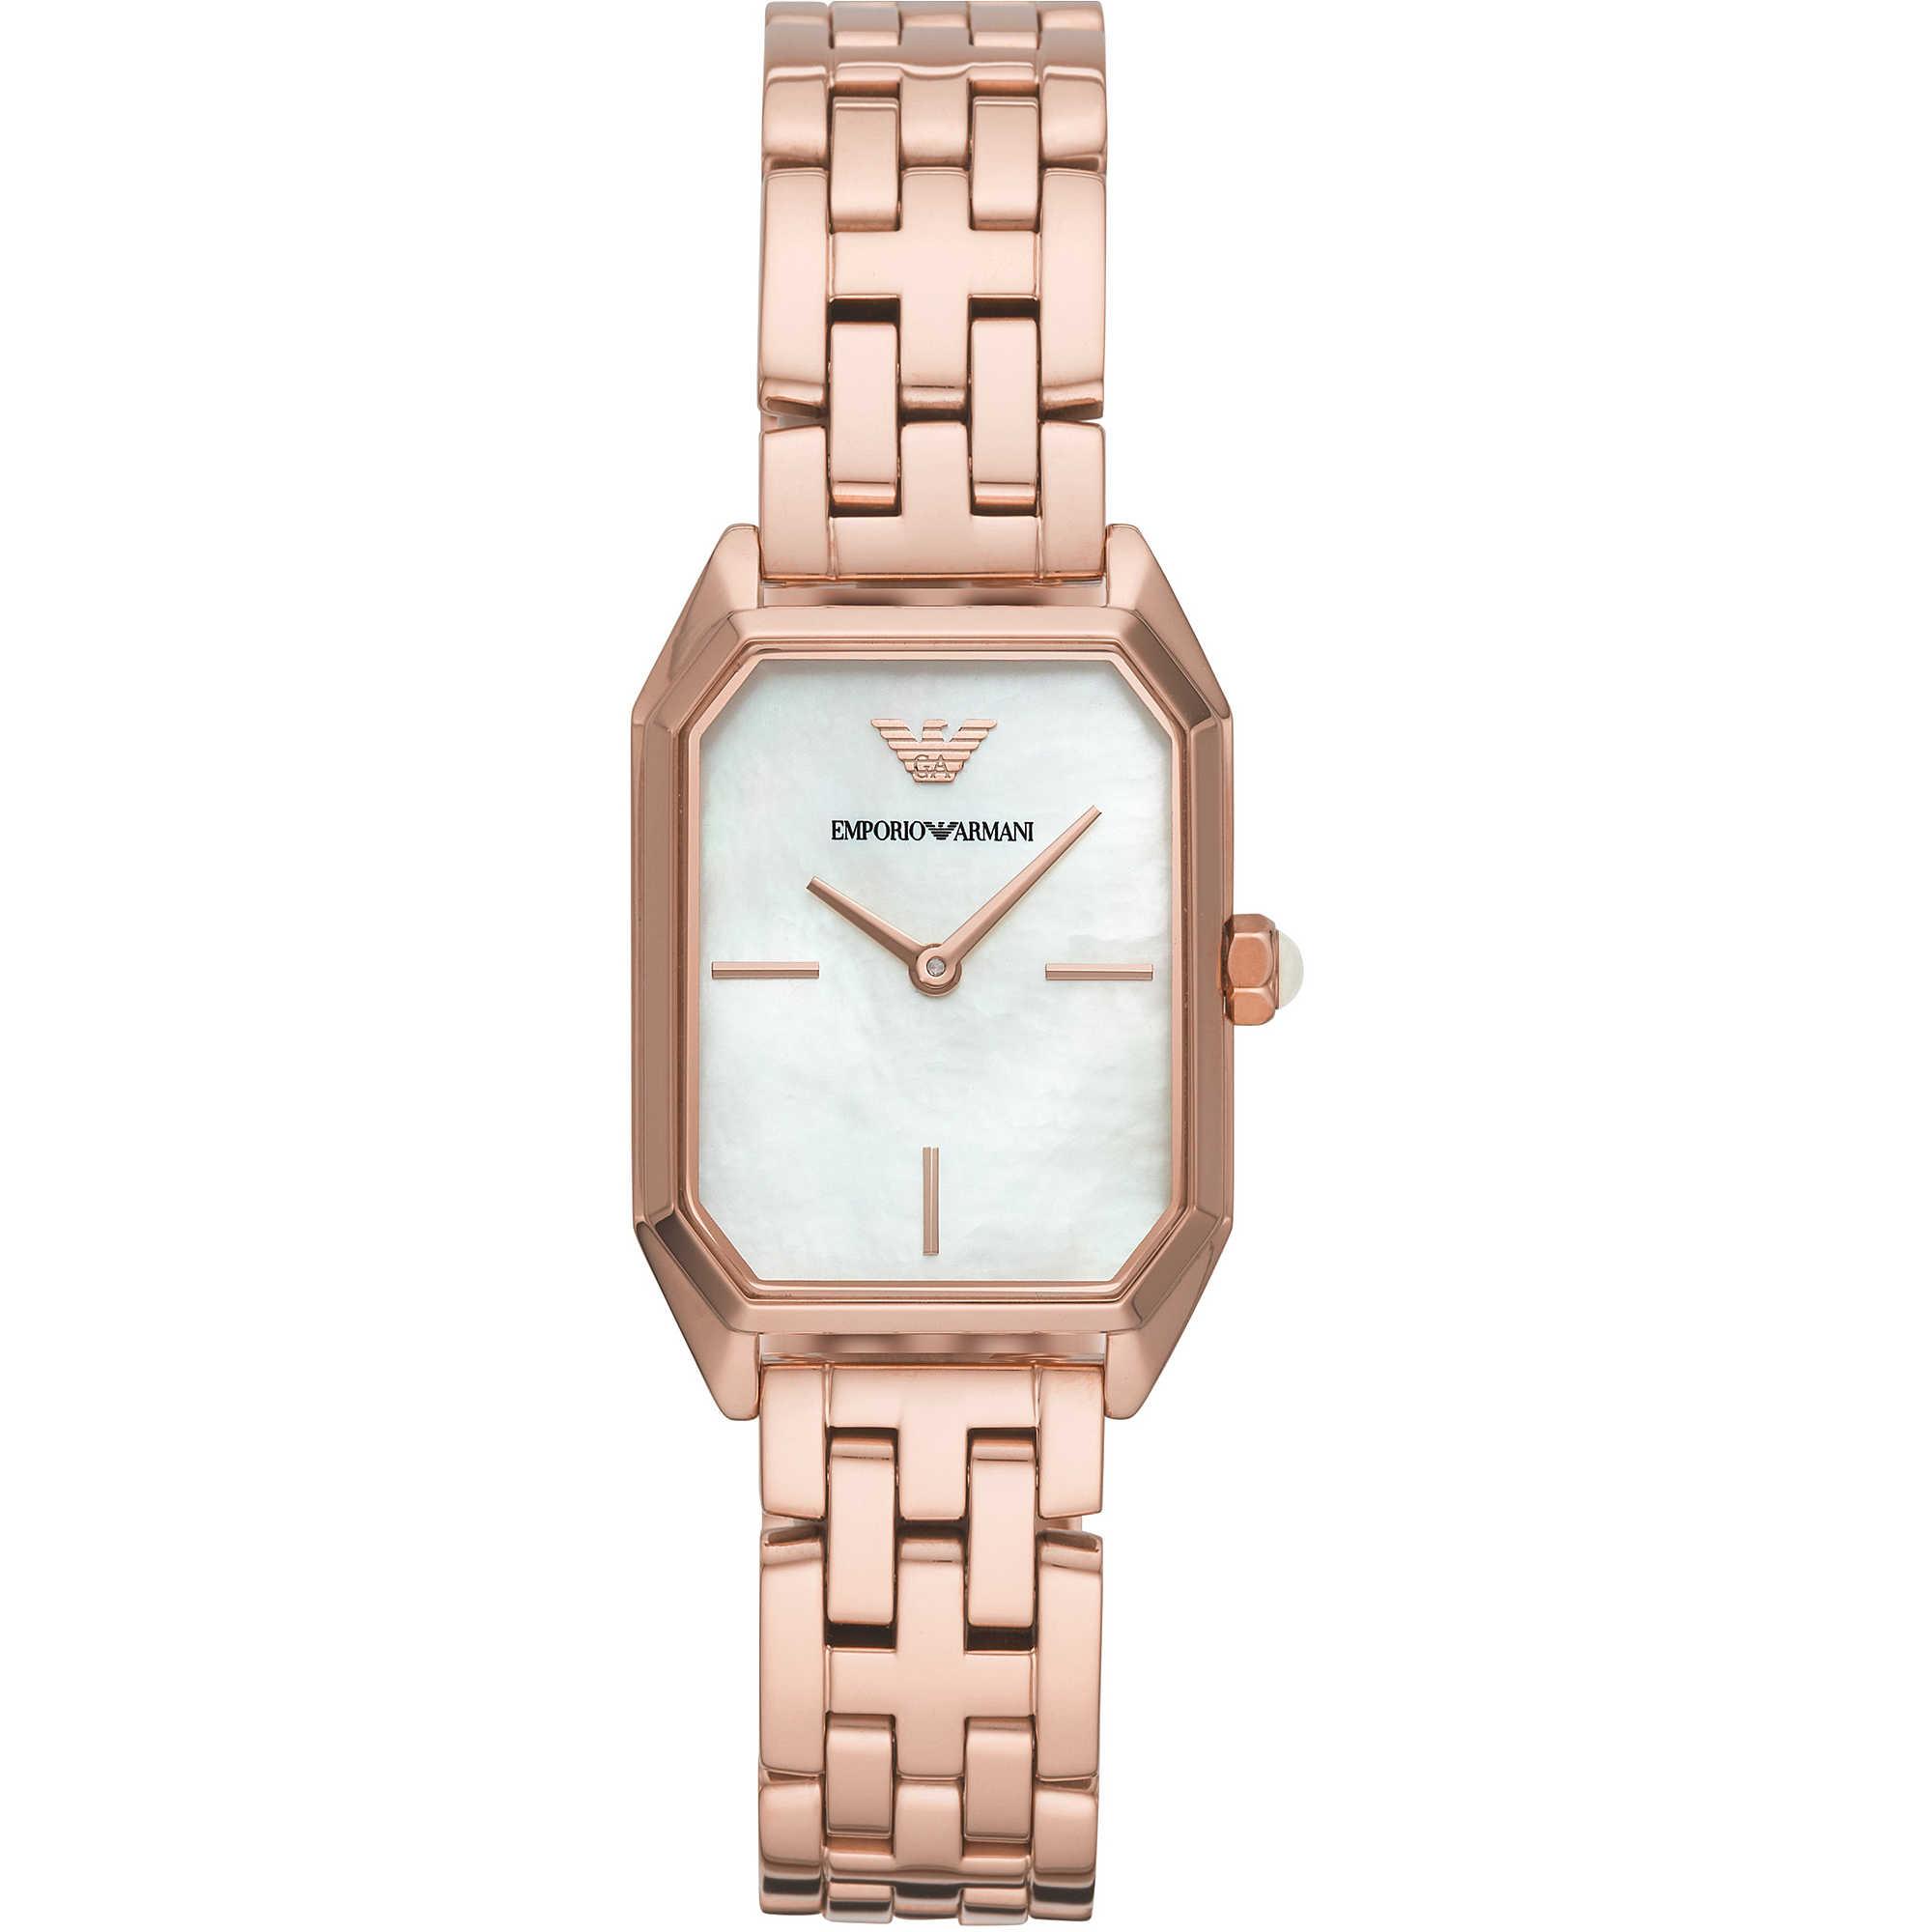 4d7a1f62be Emporio Armani Gioia Women's Watch Rose Gold AR11147 - Sunlab Malta